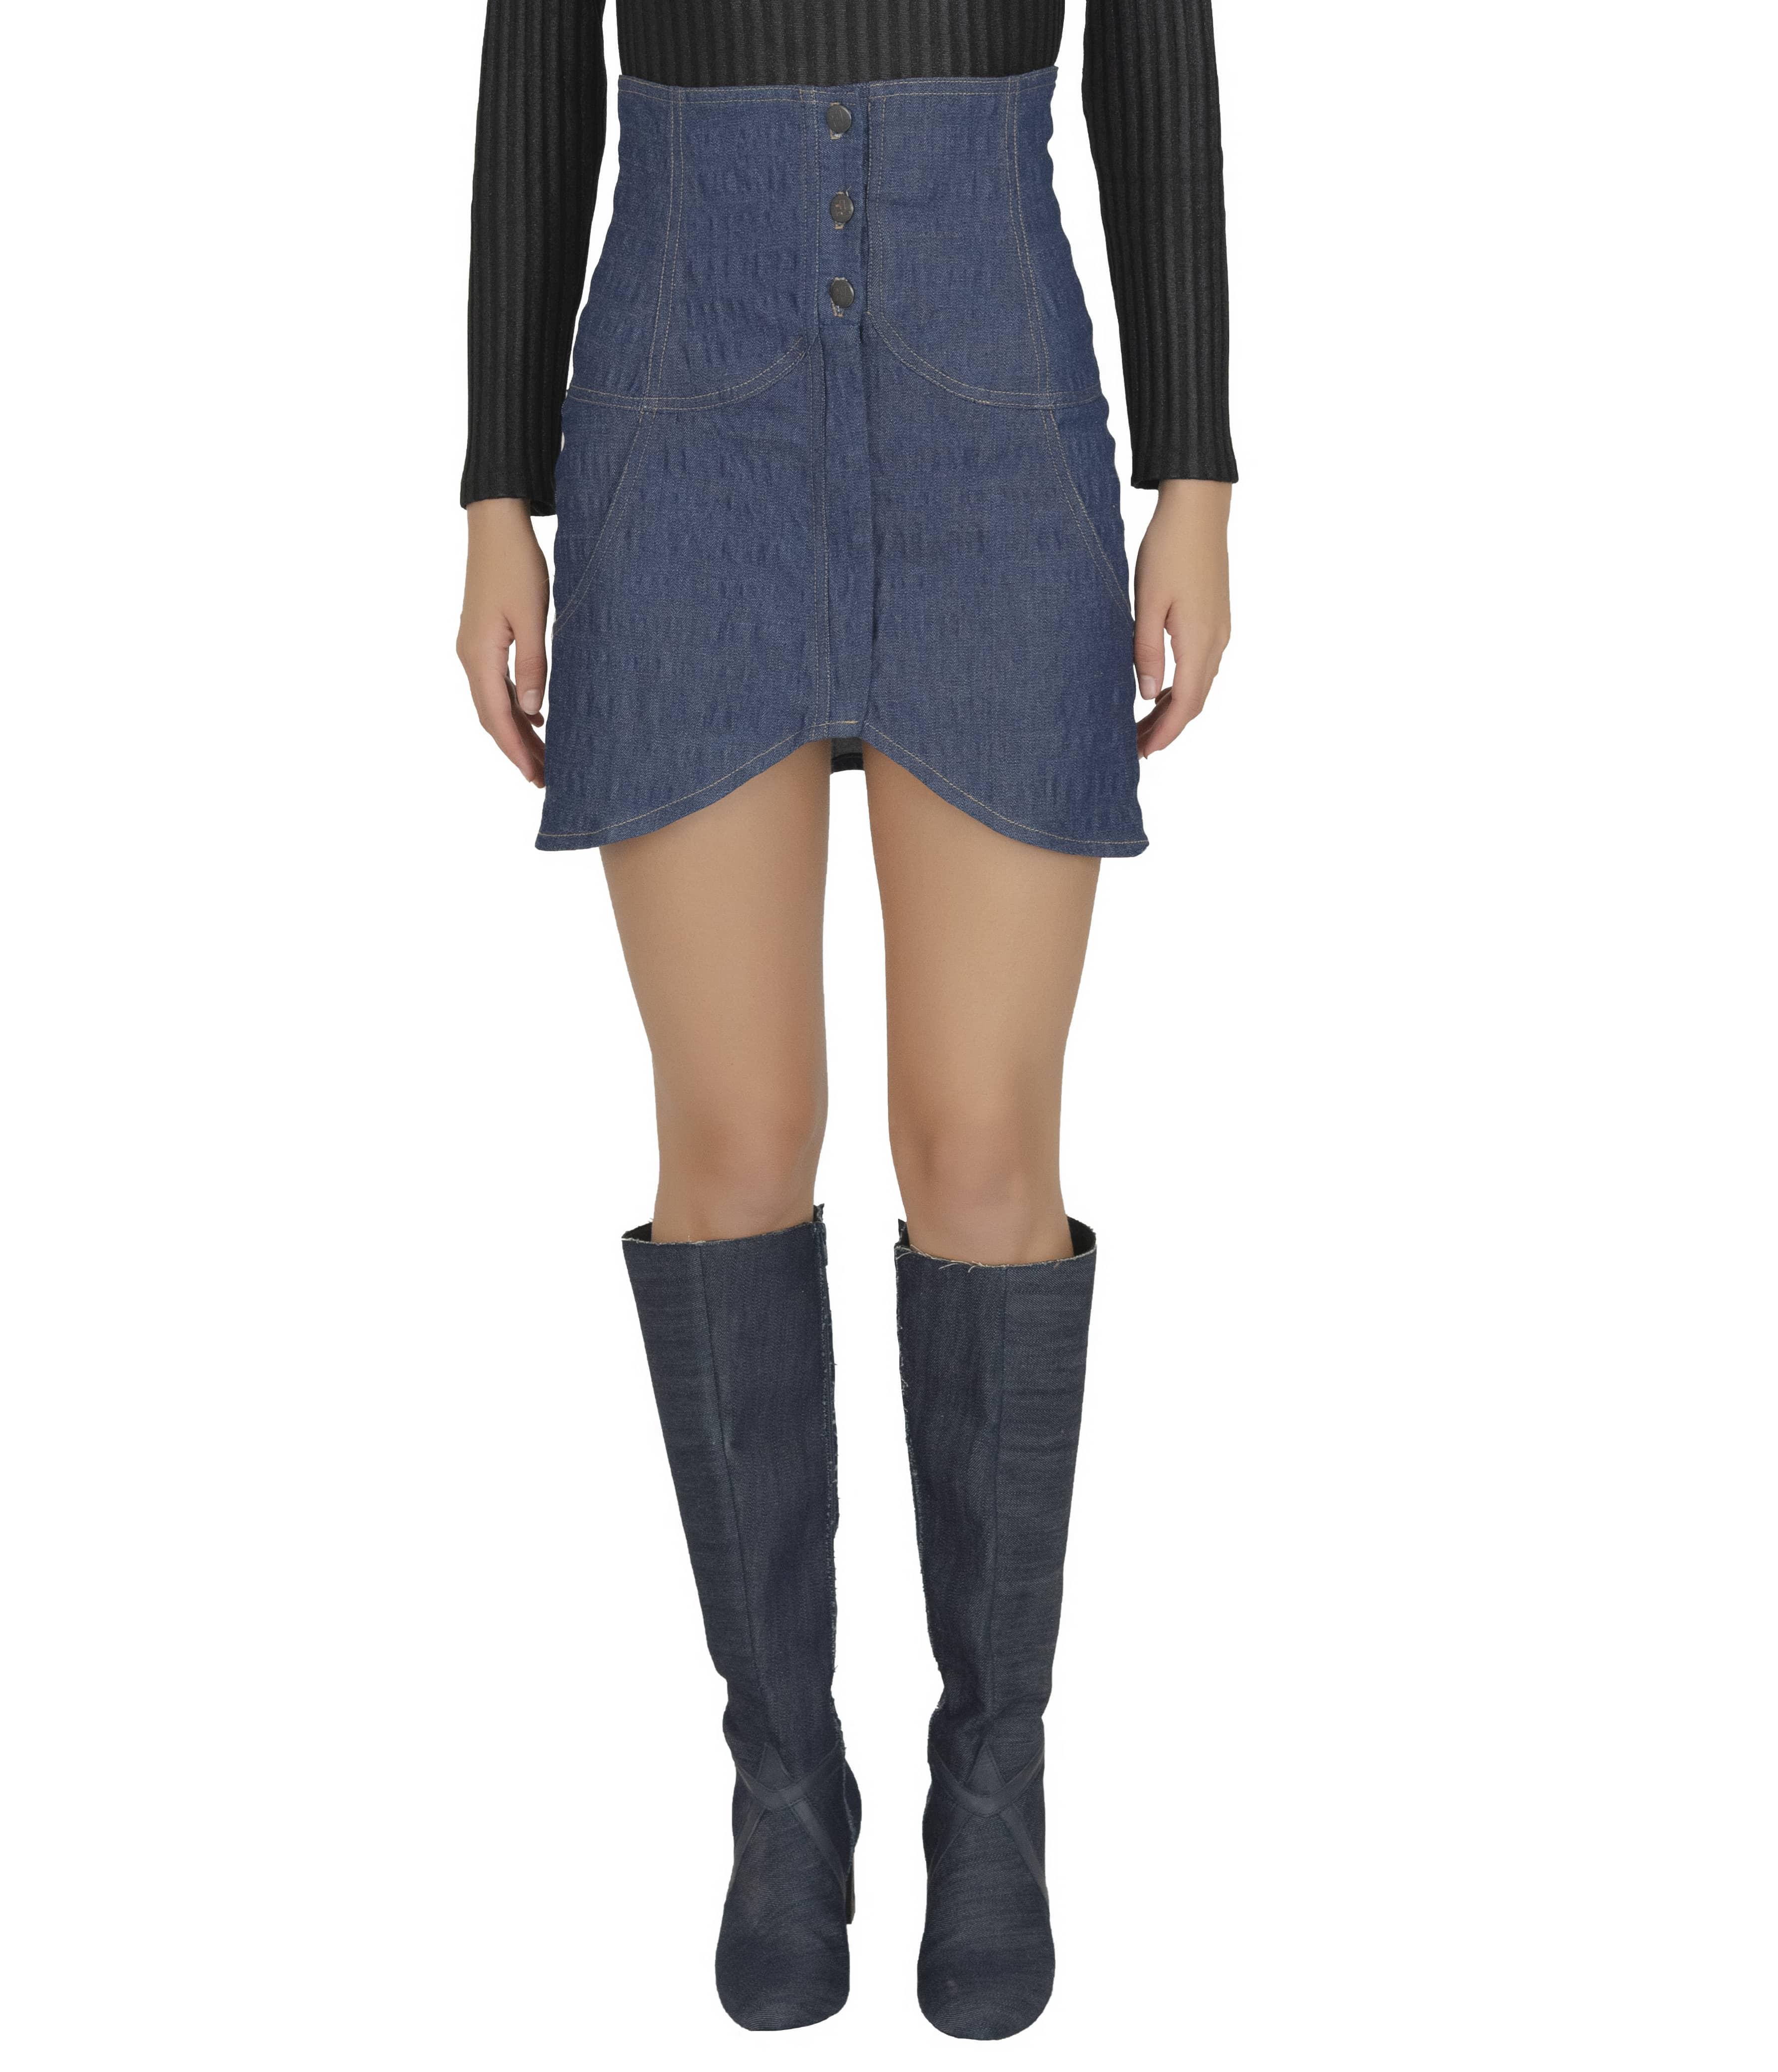 Skirt TOBAGO 1